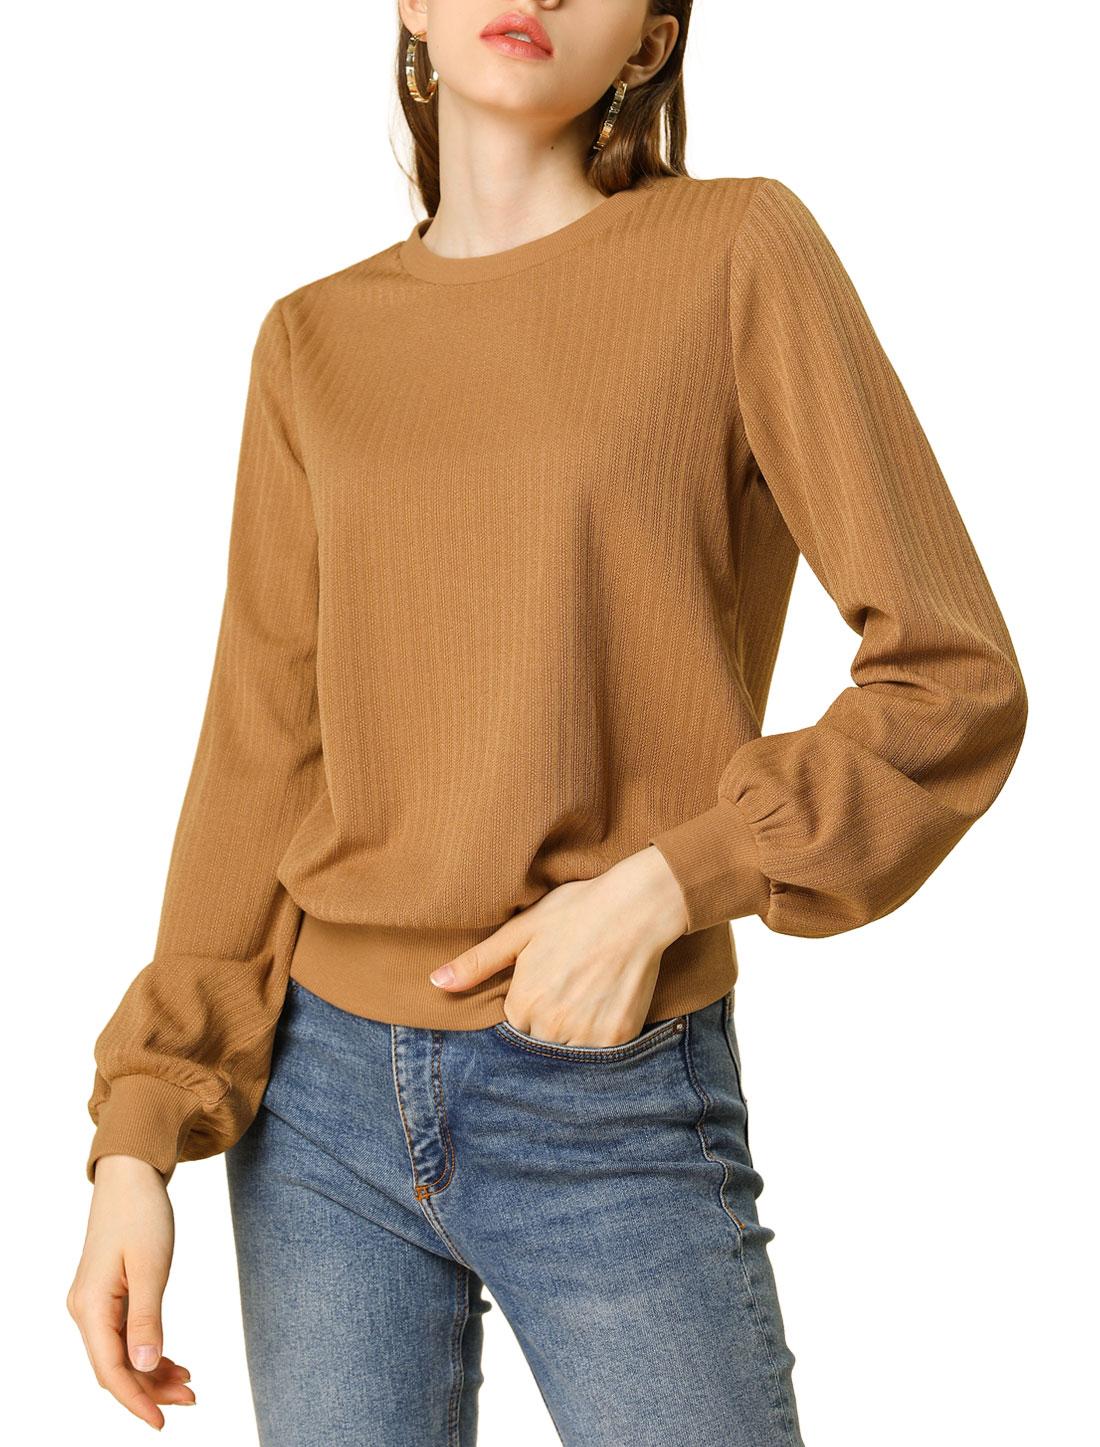 Allegra K Women's Classic Lantern Sleeves Blouson Ribbed Top Sweater Brown XL